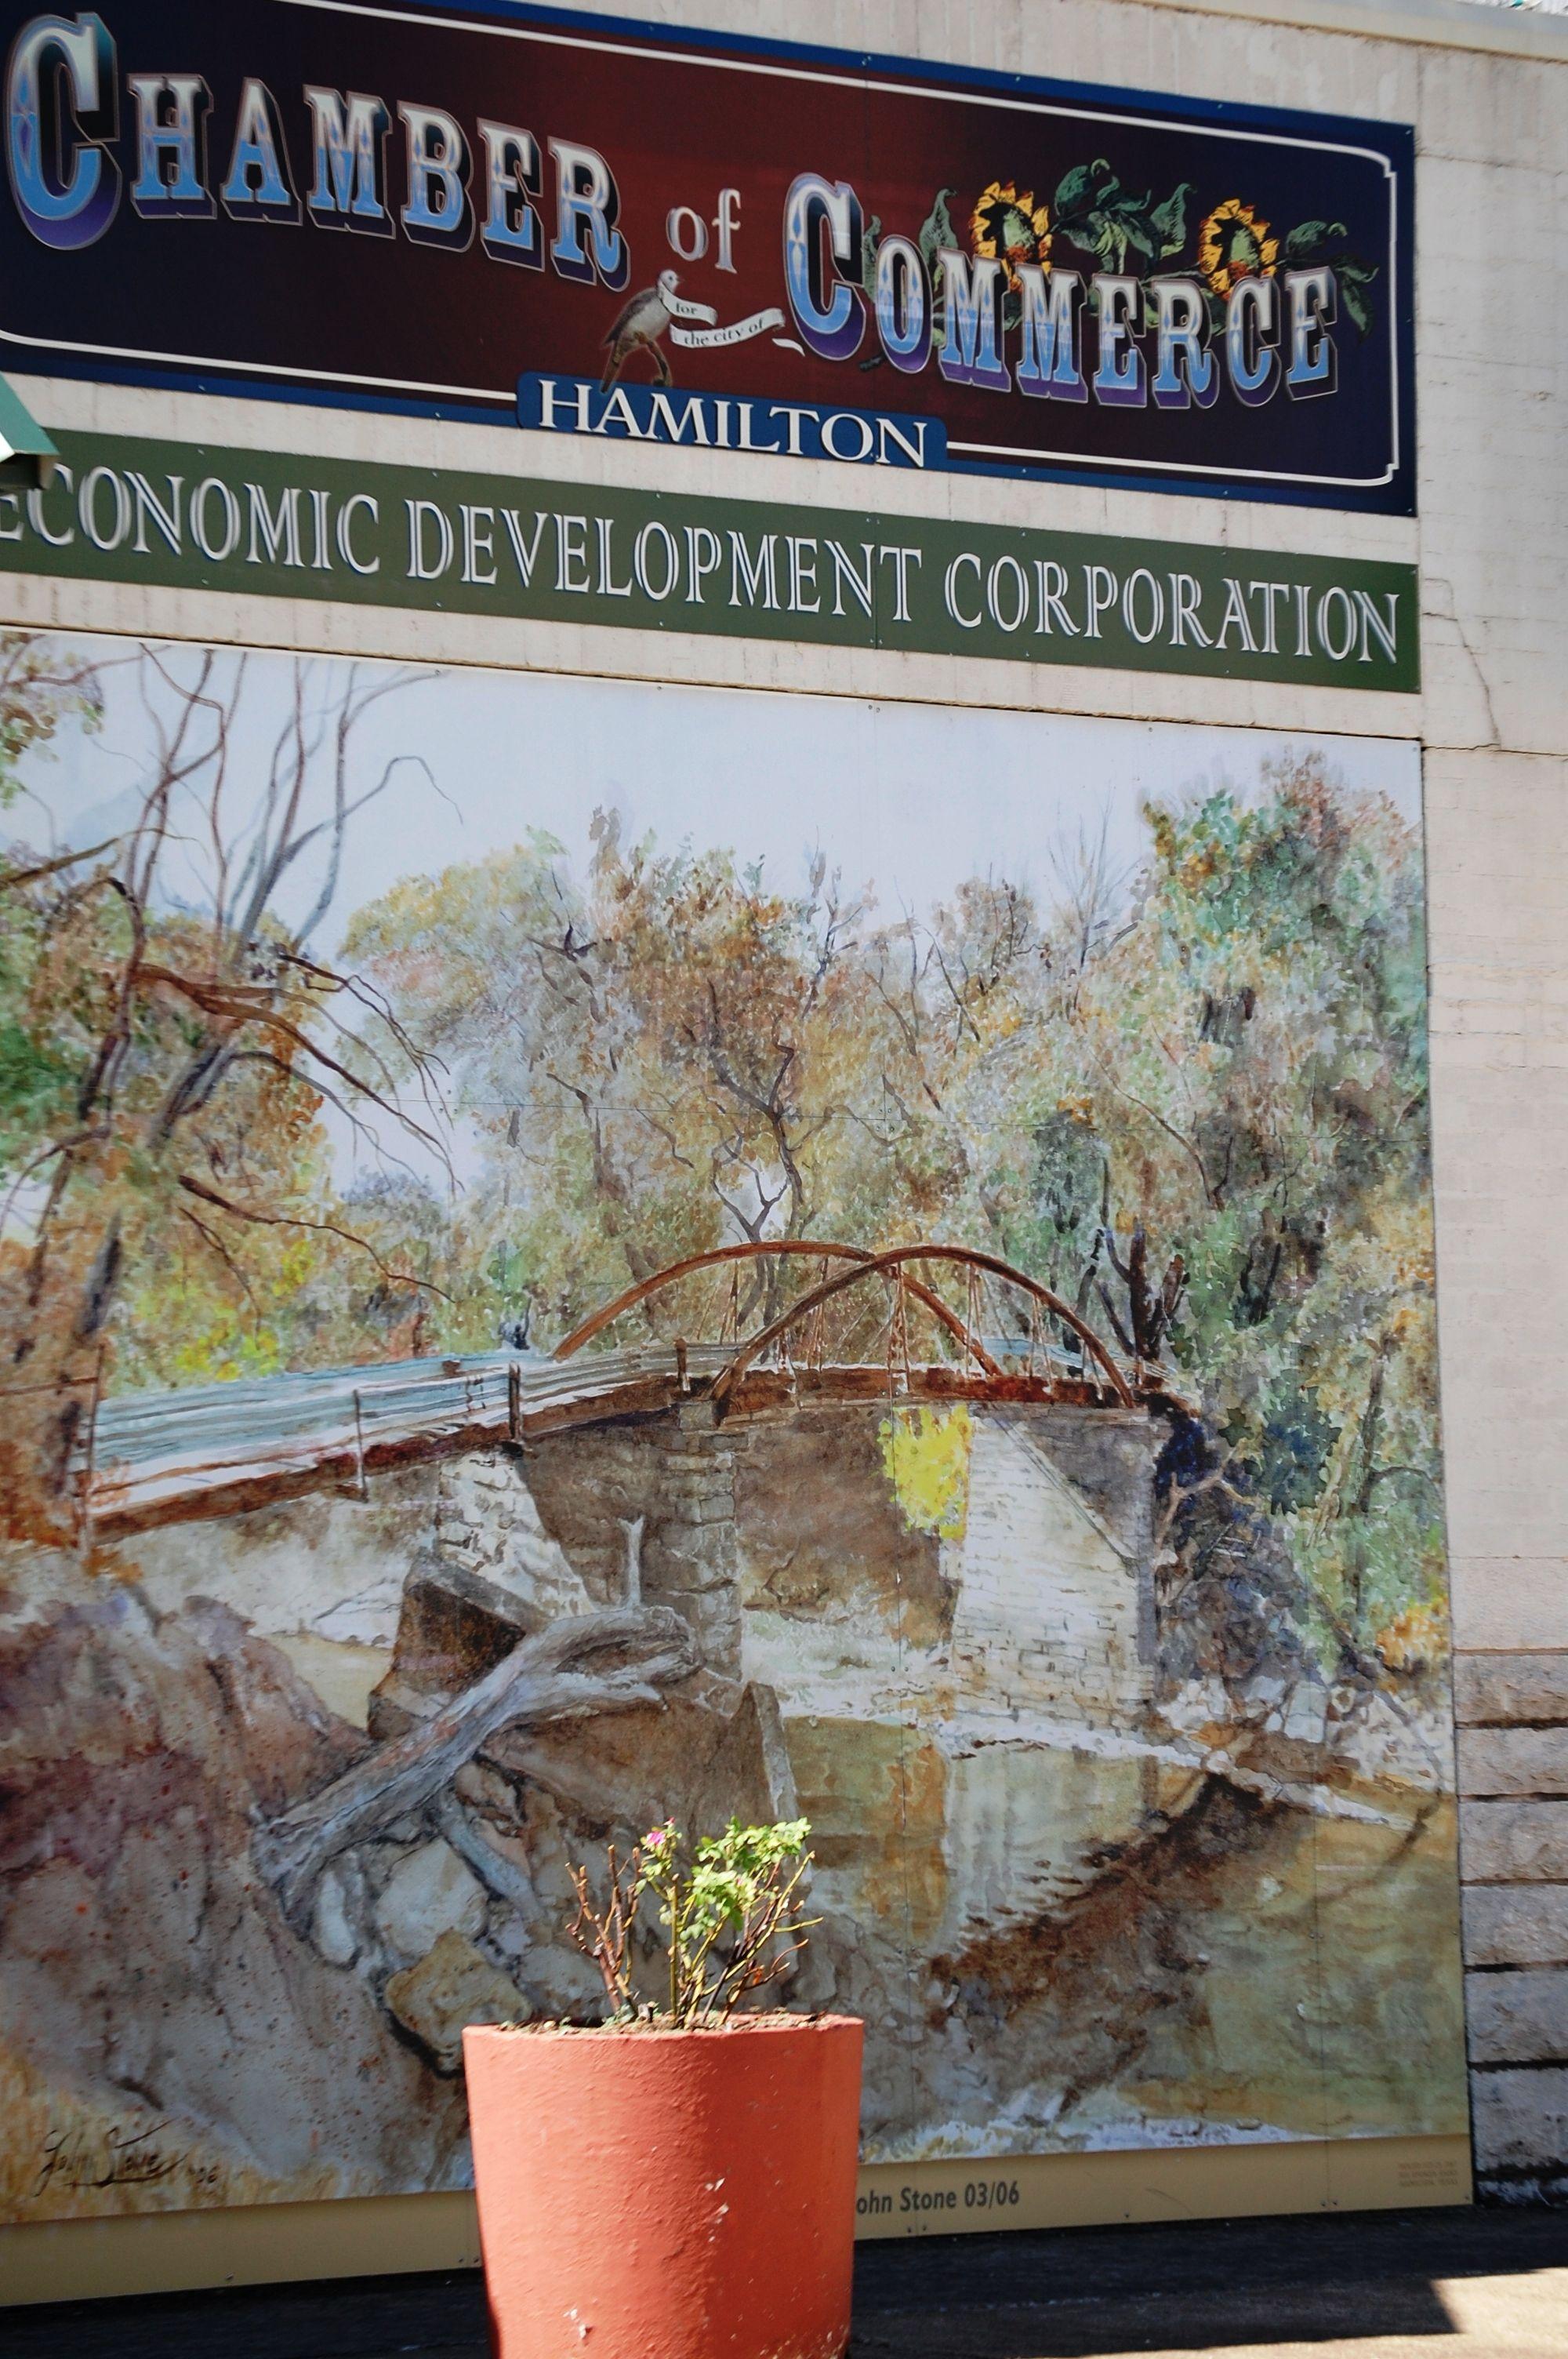 Wall Mural In Hamilton, Texas